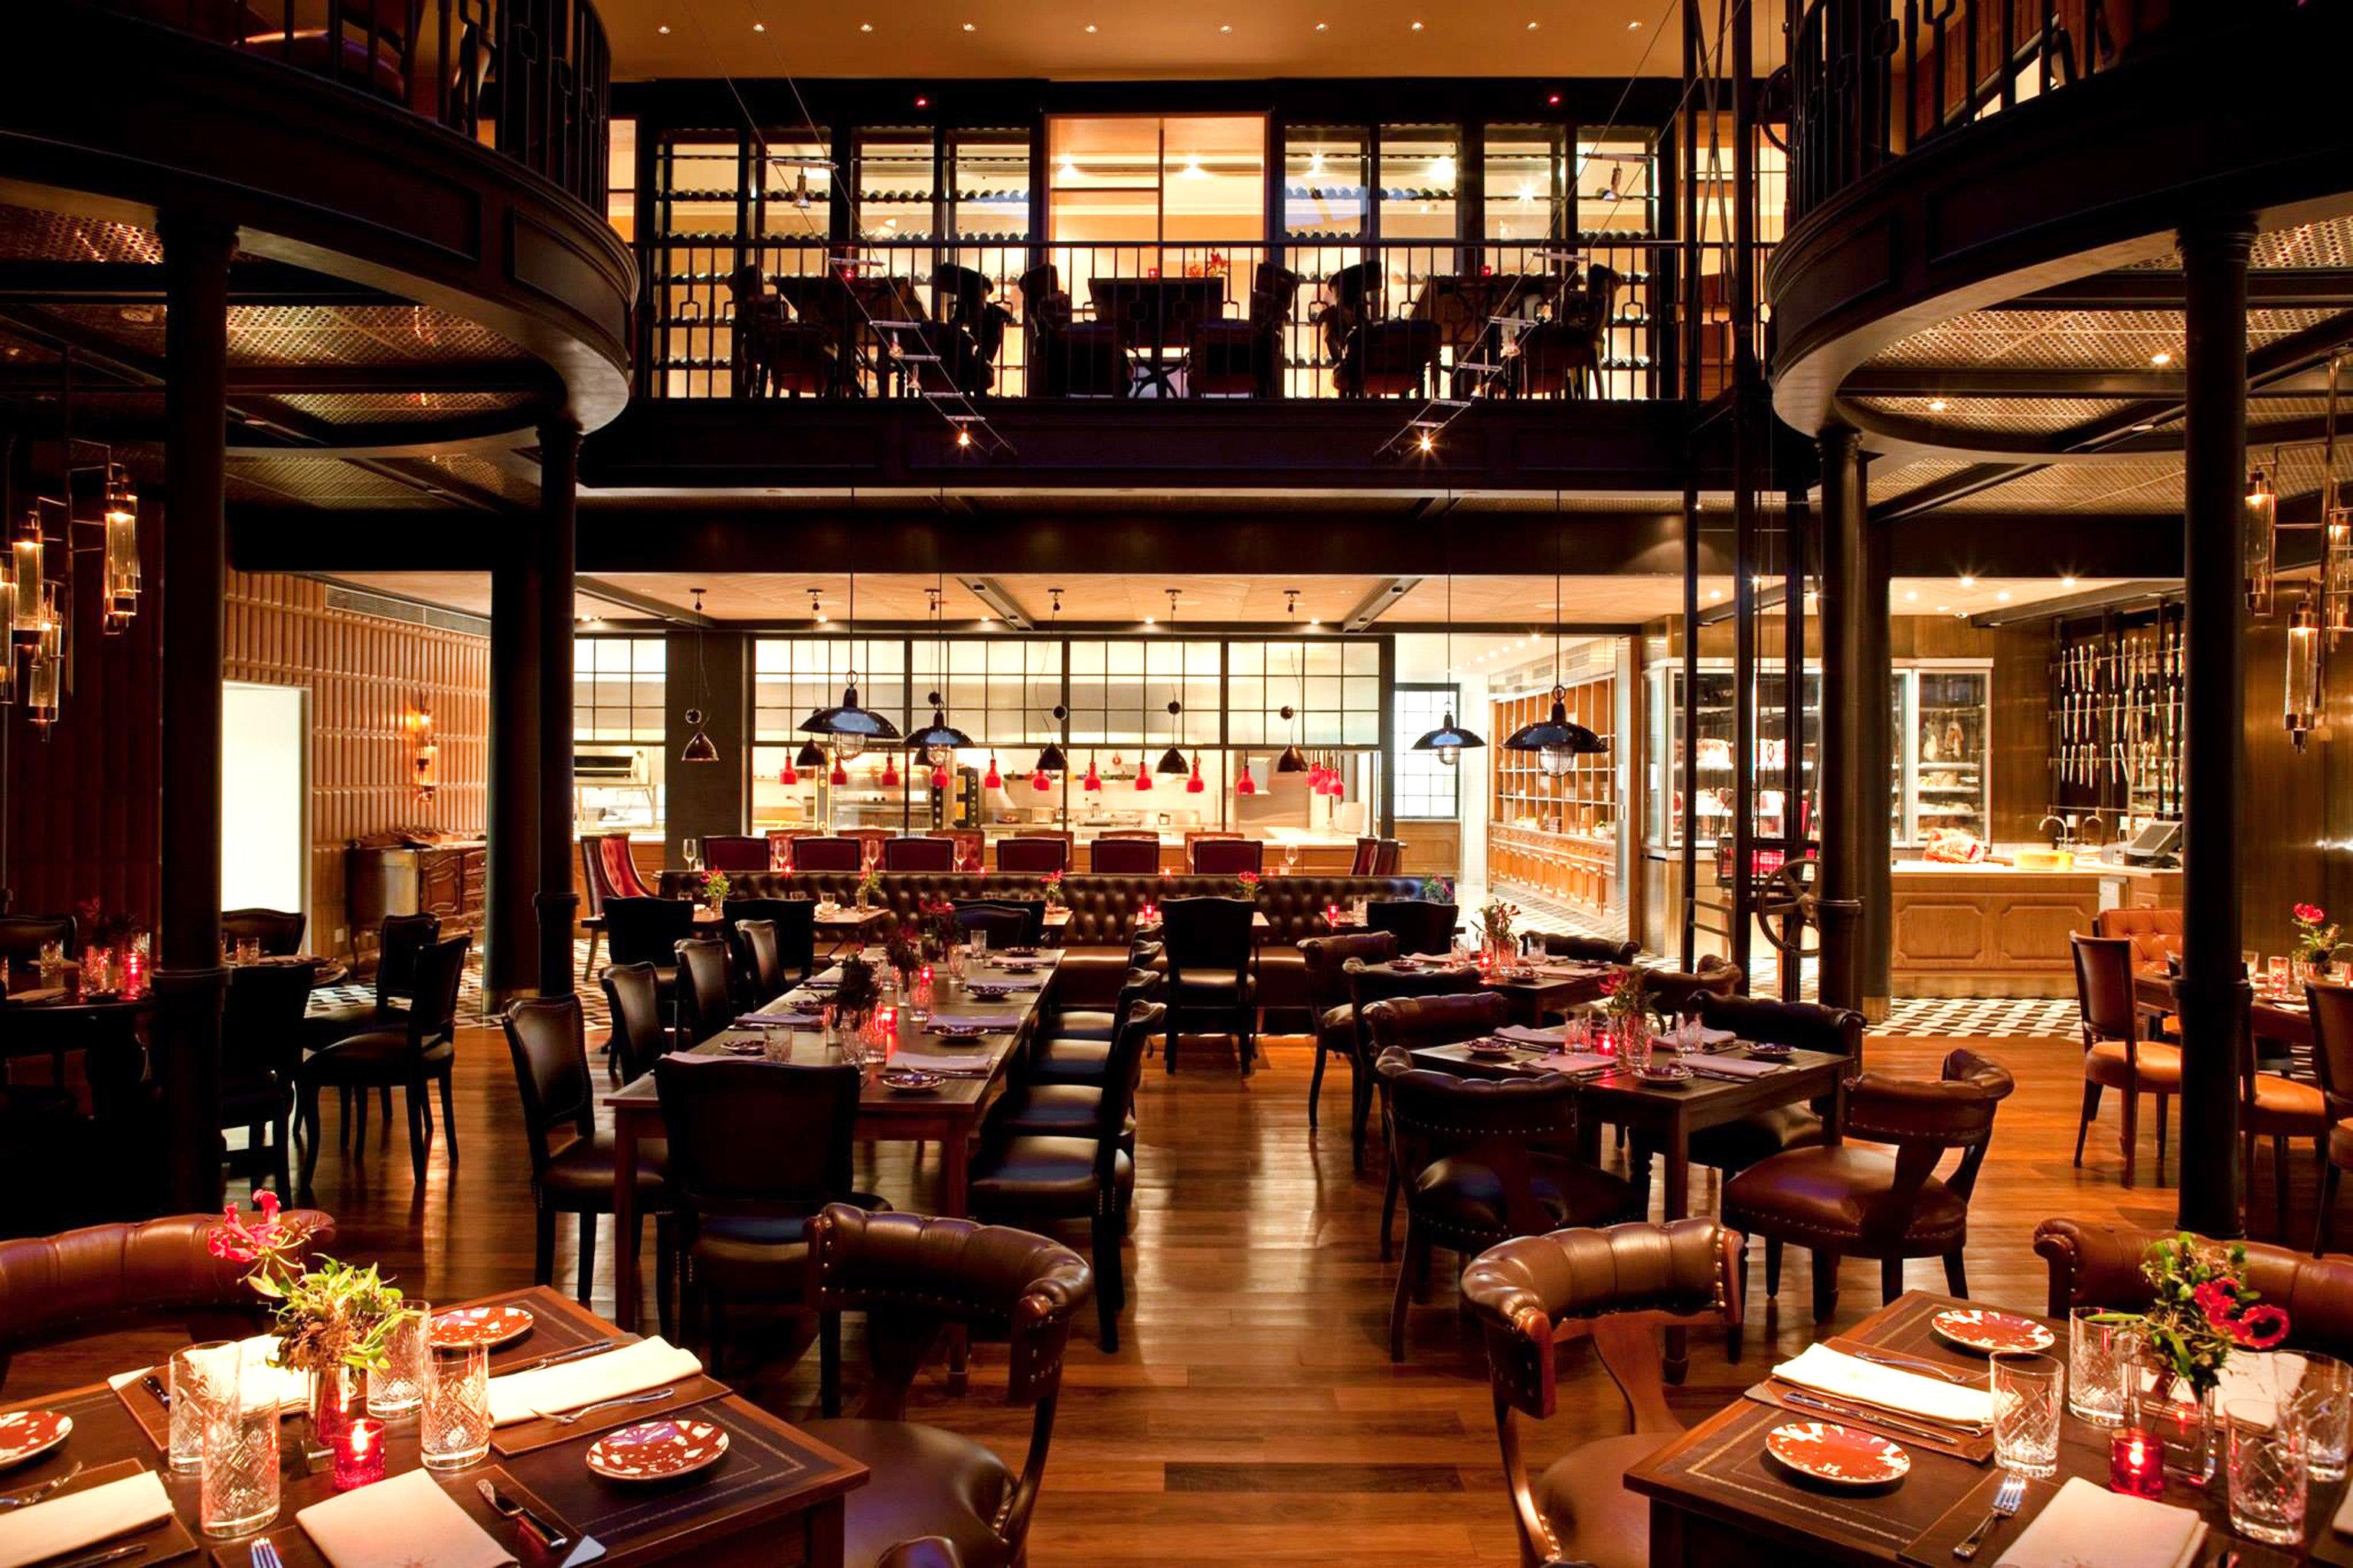 Bar Dining Drink Eat Modern Trip Ideas table indoor restaurant café meal interior design furniture several dining room